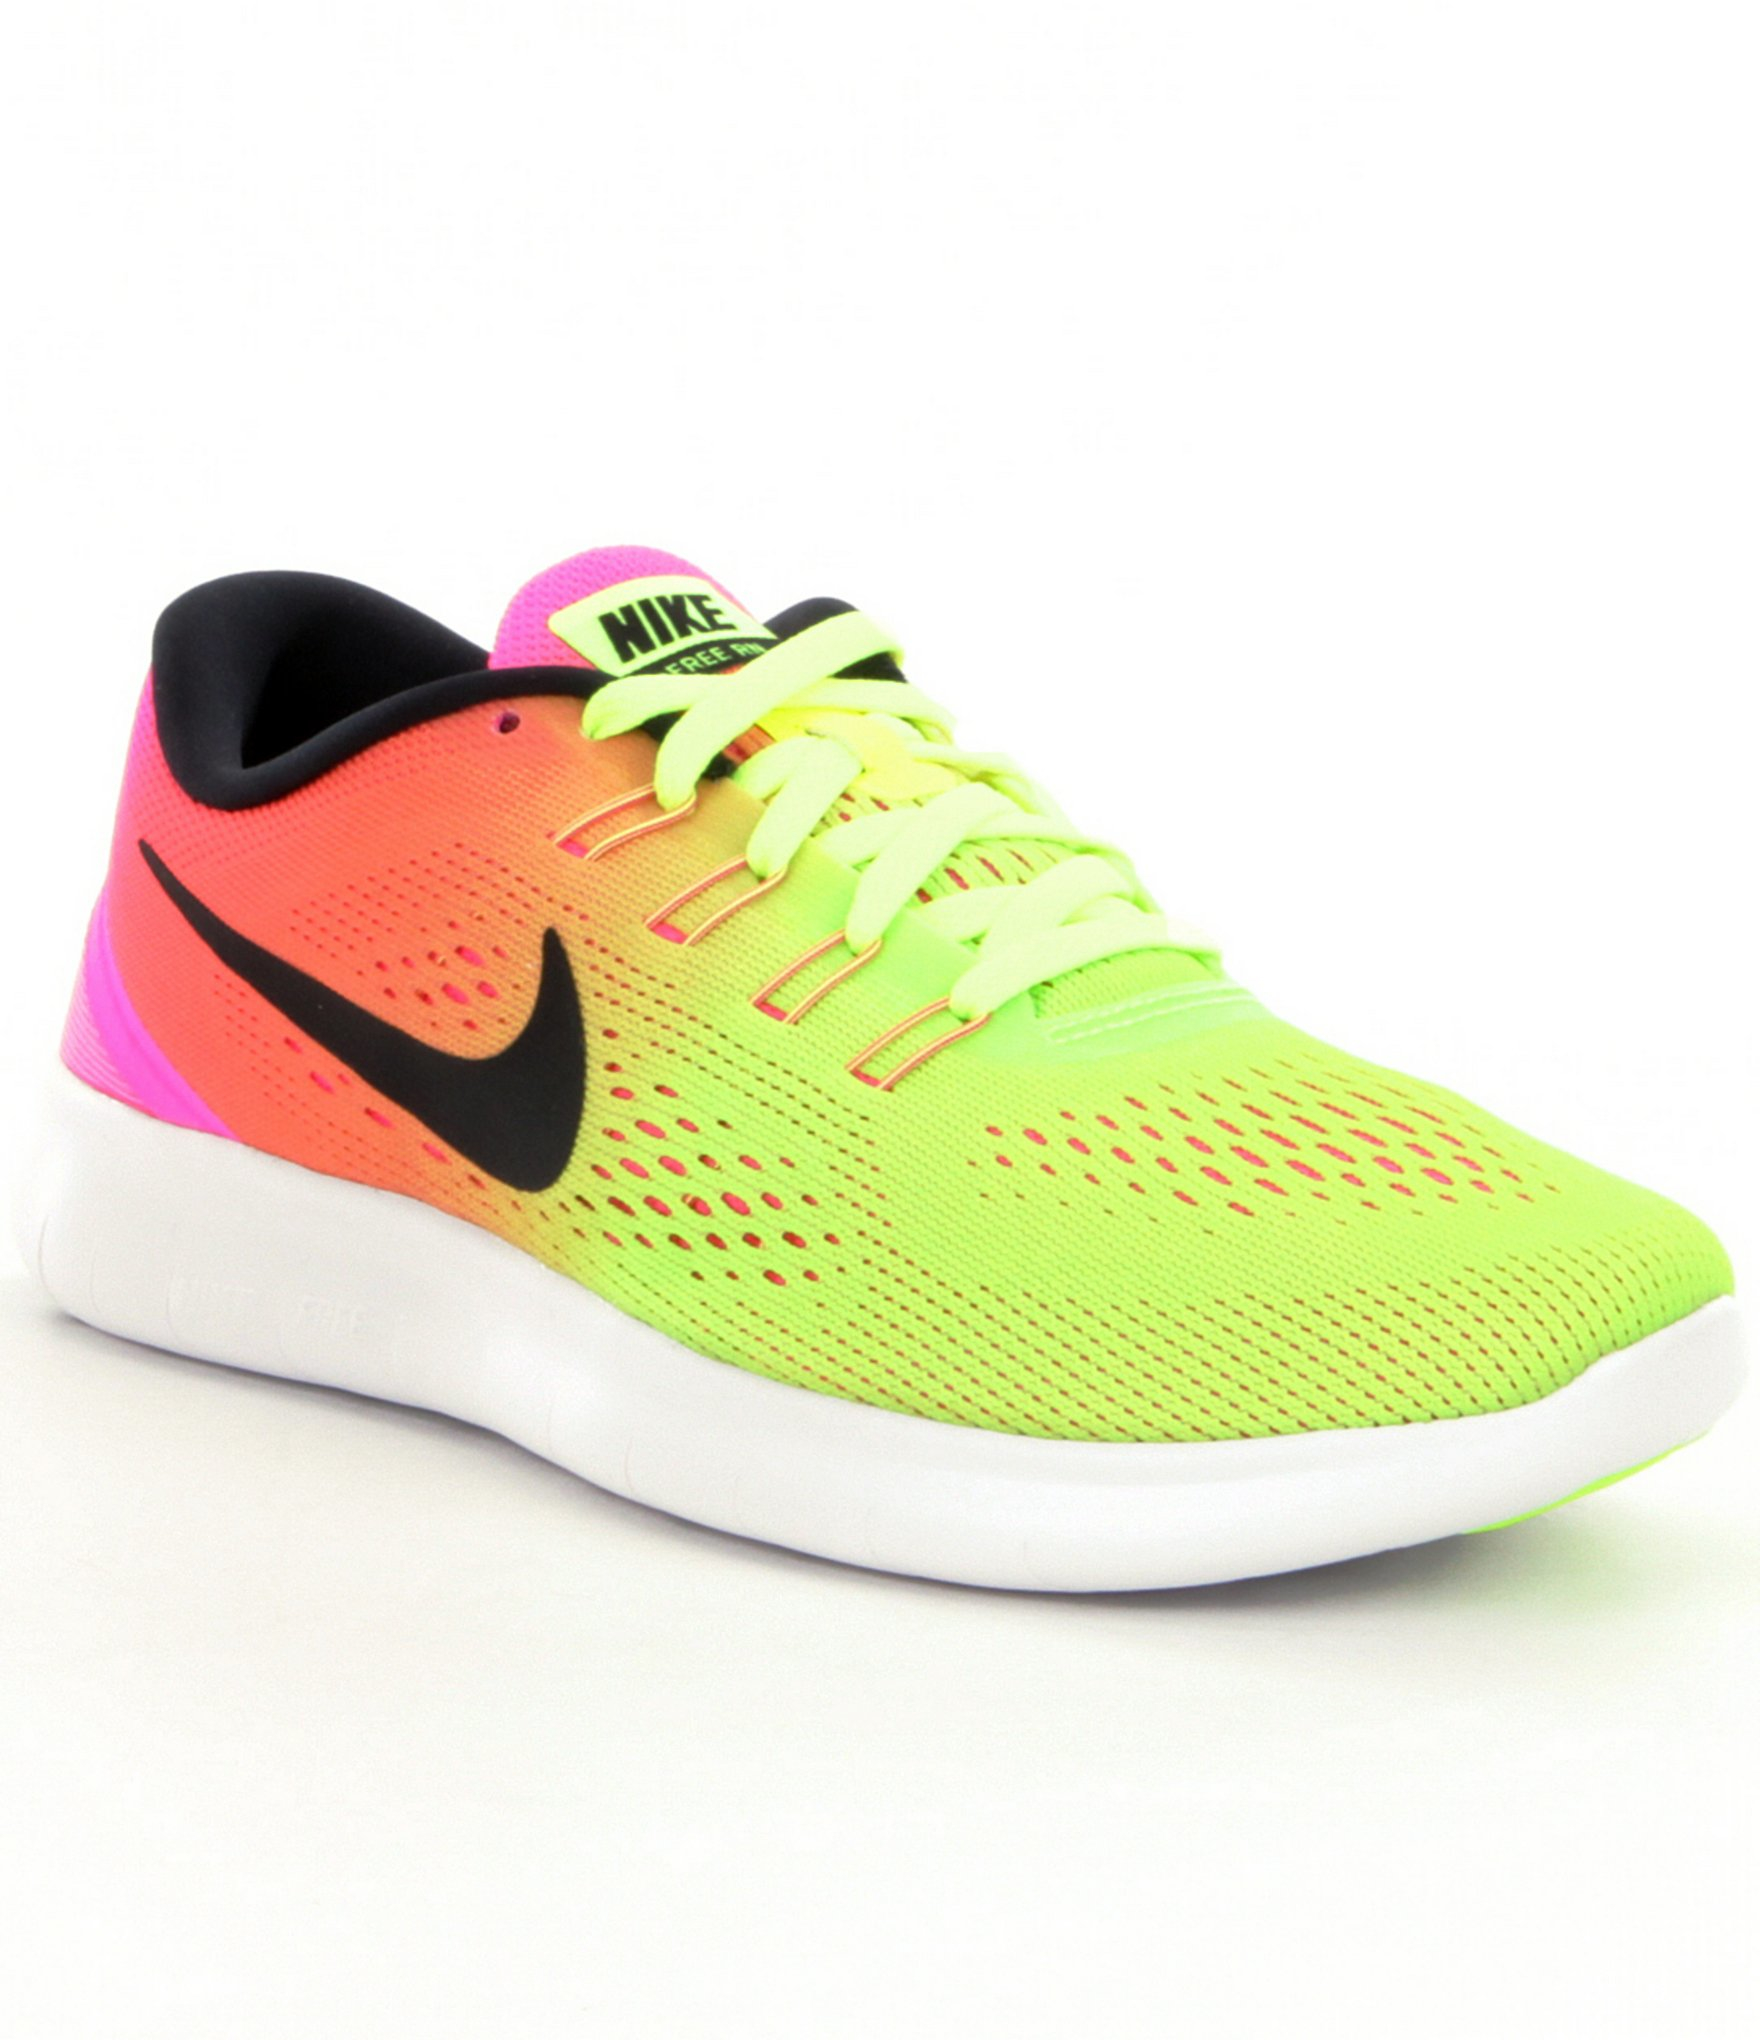 6eb45c4070f7 ... training shoes 6a8be c054e  coupon black fridaynike free run 5.0 womens  dillards free 4.0 flyknit grey volt green lyst nike